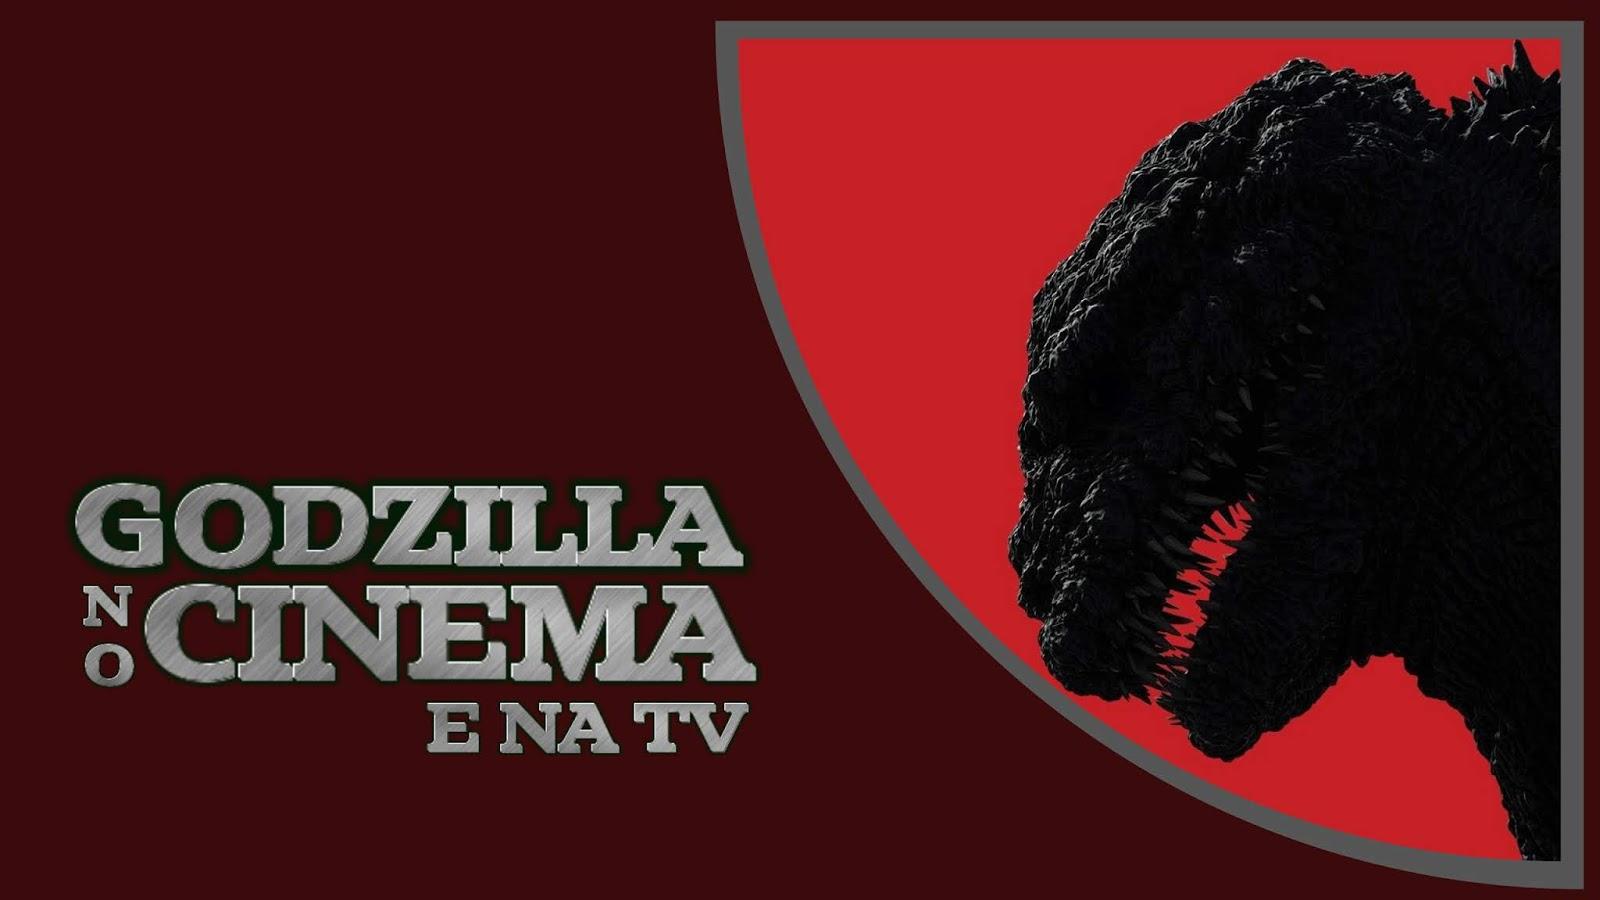 godzilla-no-cinema-tv